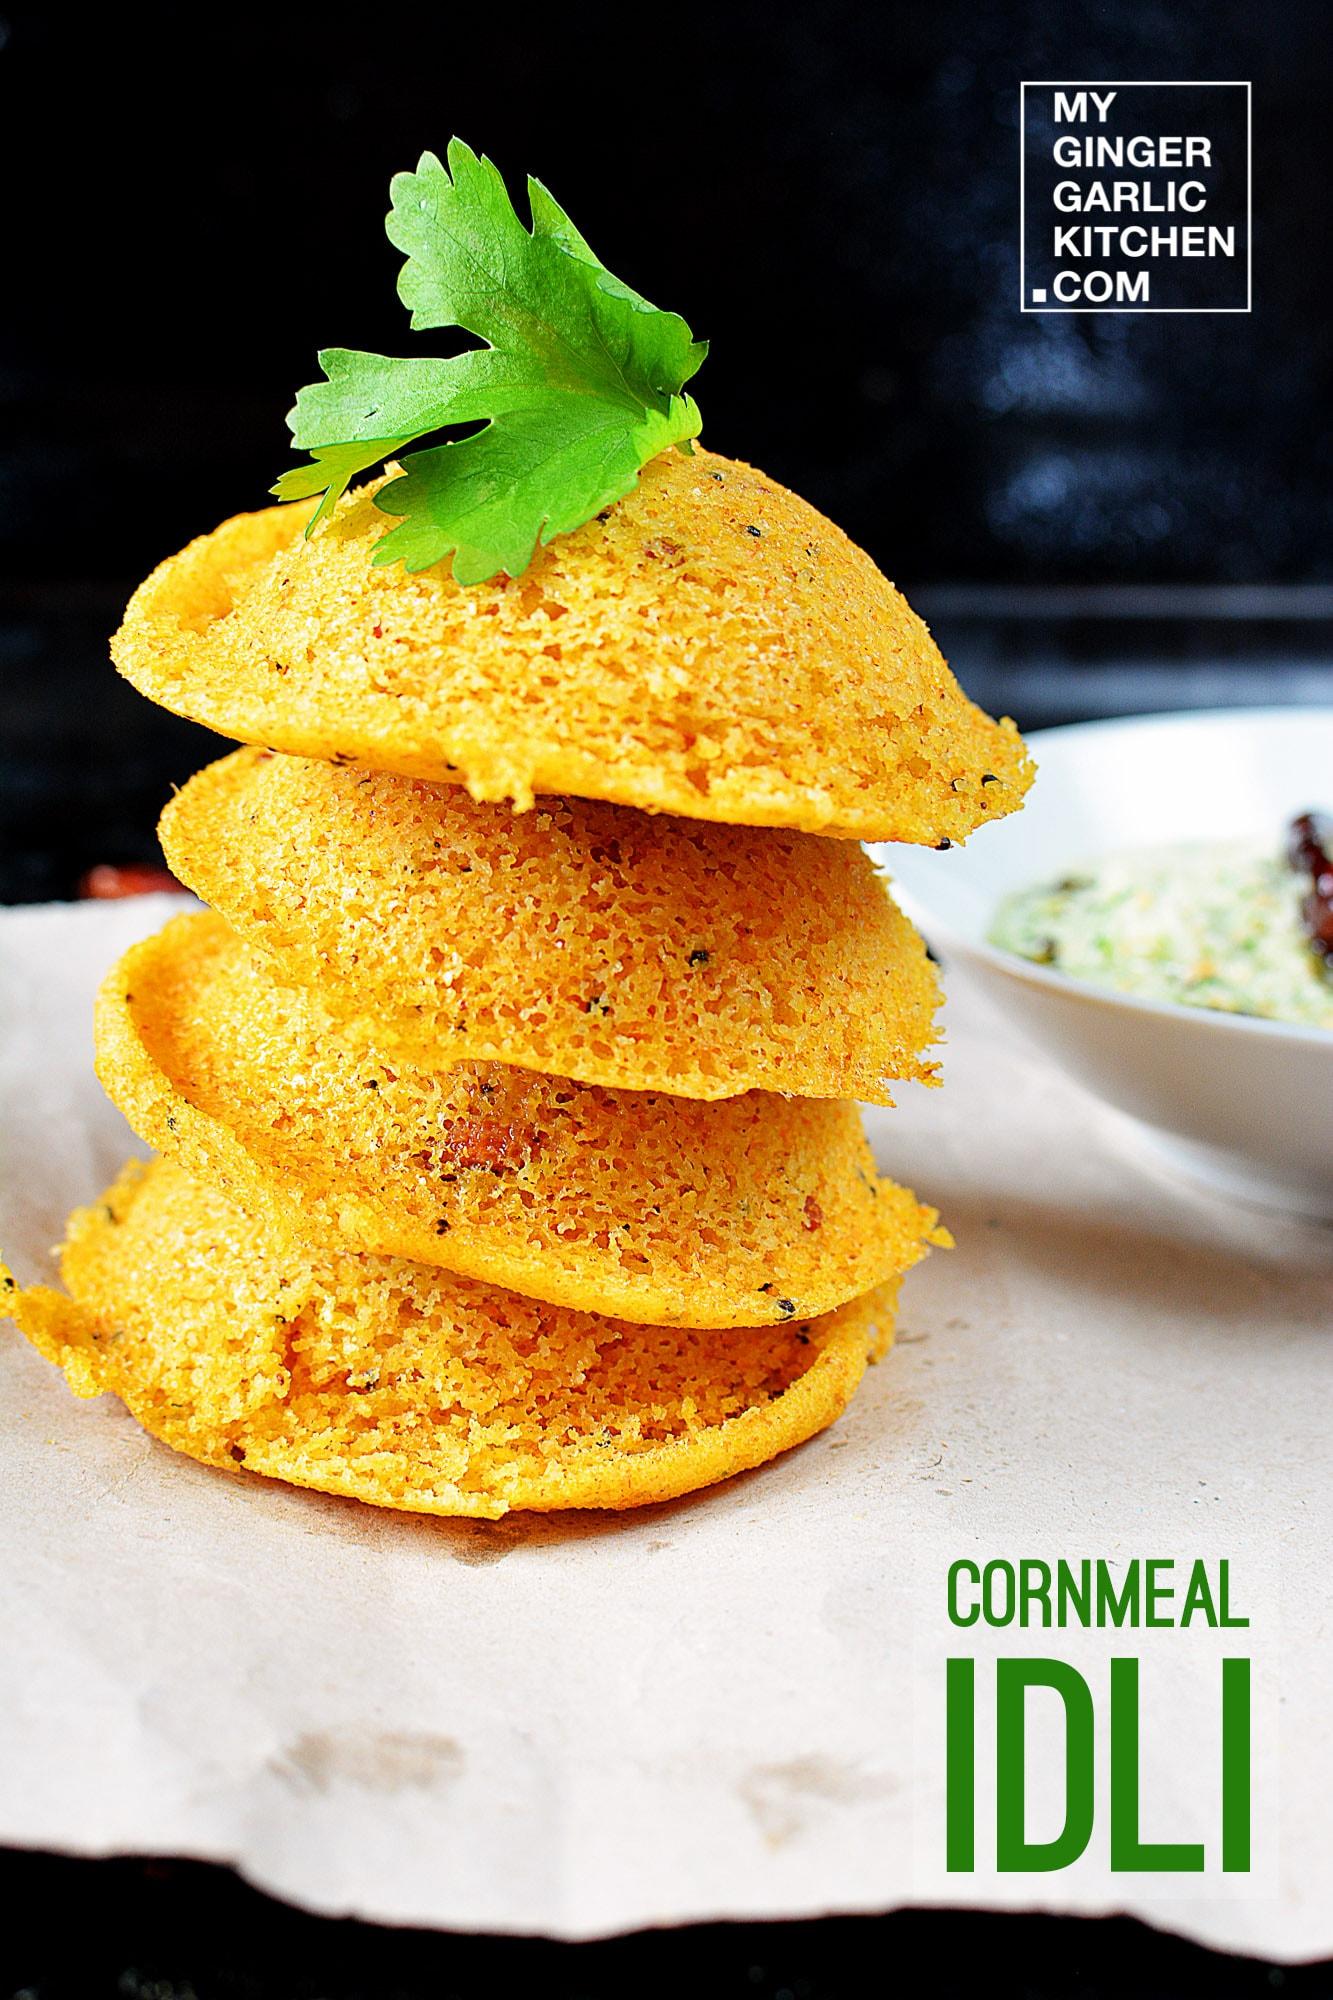 recipe-cornmeal-idli-anupama-paliwal-my-ginger-garlic-kitchen-2